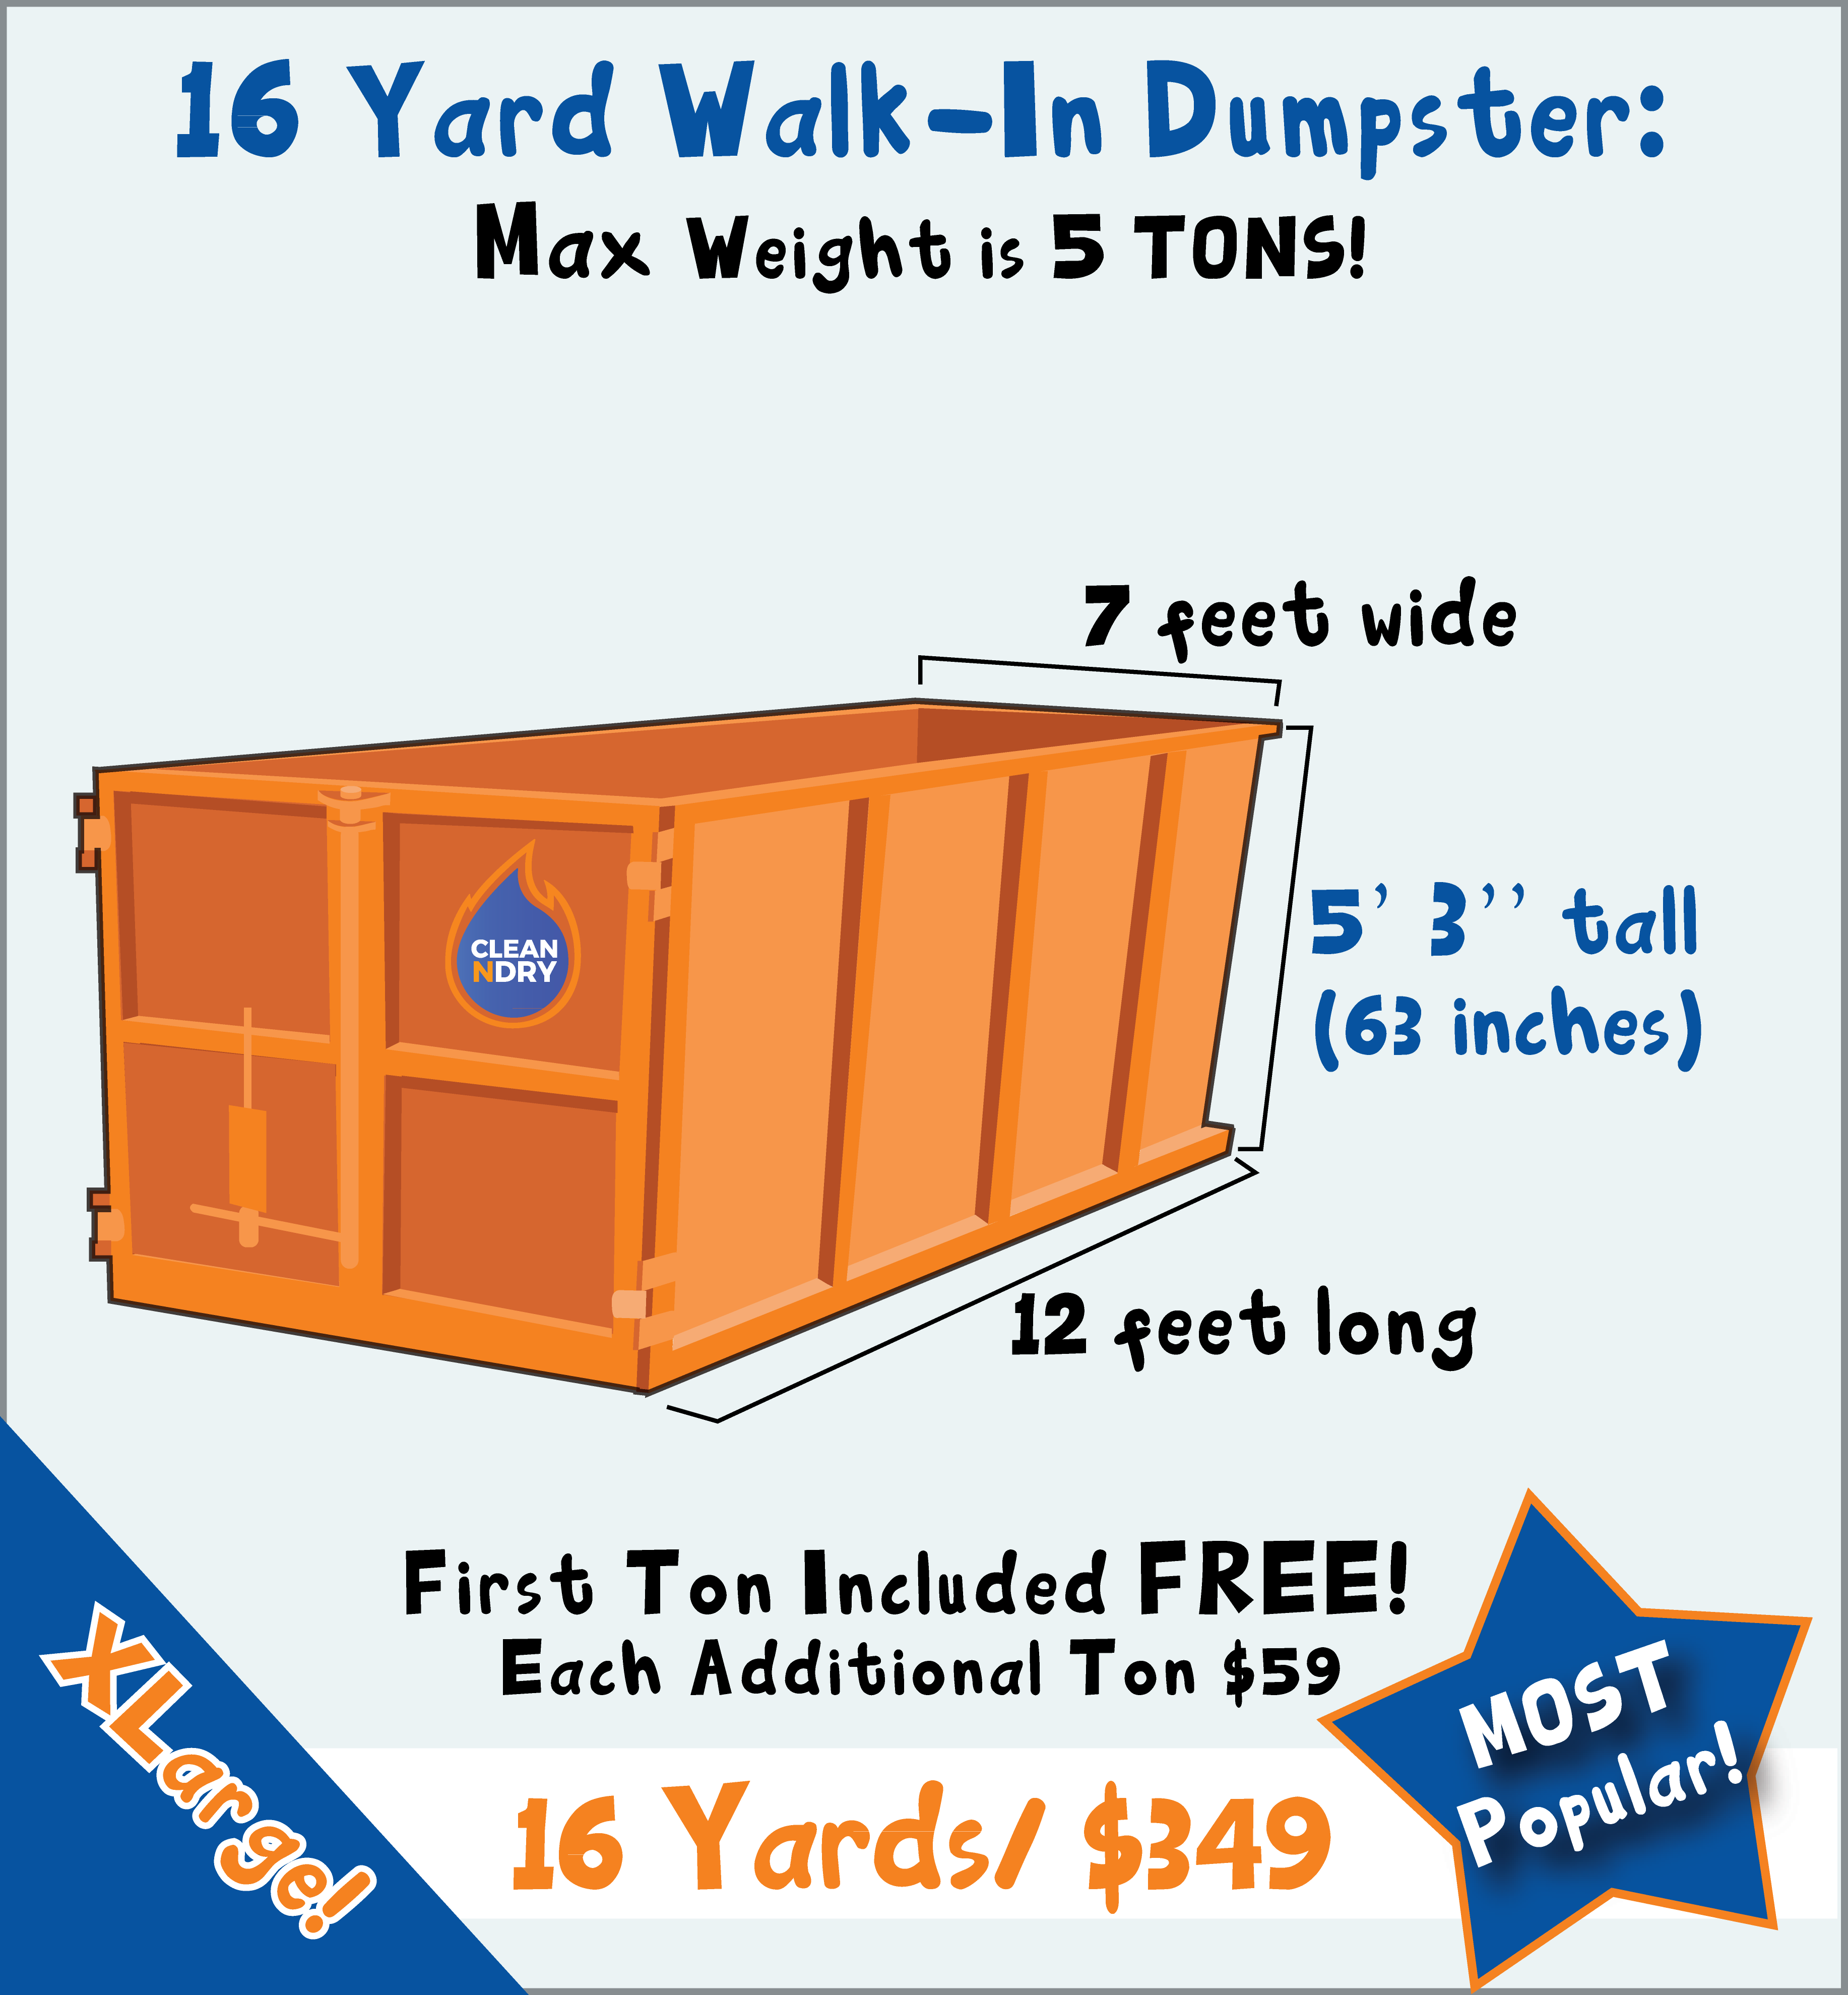 Rent a dumpster delivery orlando trash bin rental walk in dumpster rental orlando 16 yard